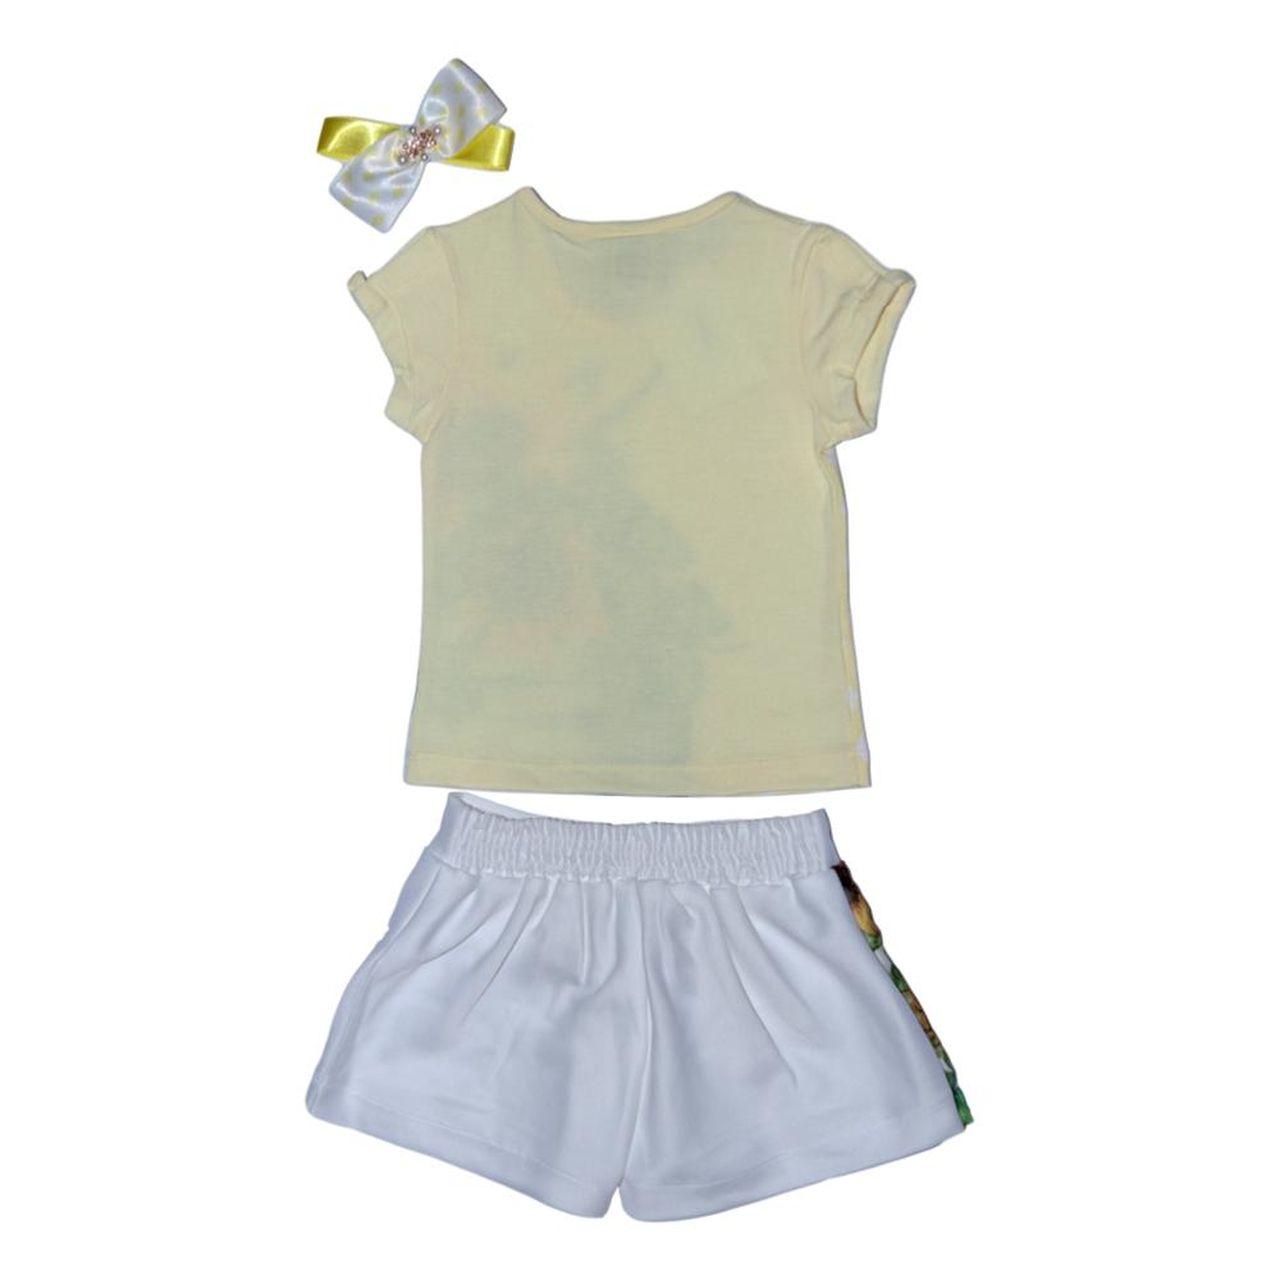 Conjunto Saia Shorts Transpassado Estampa Girassol